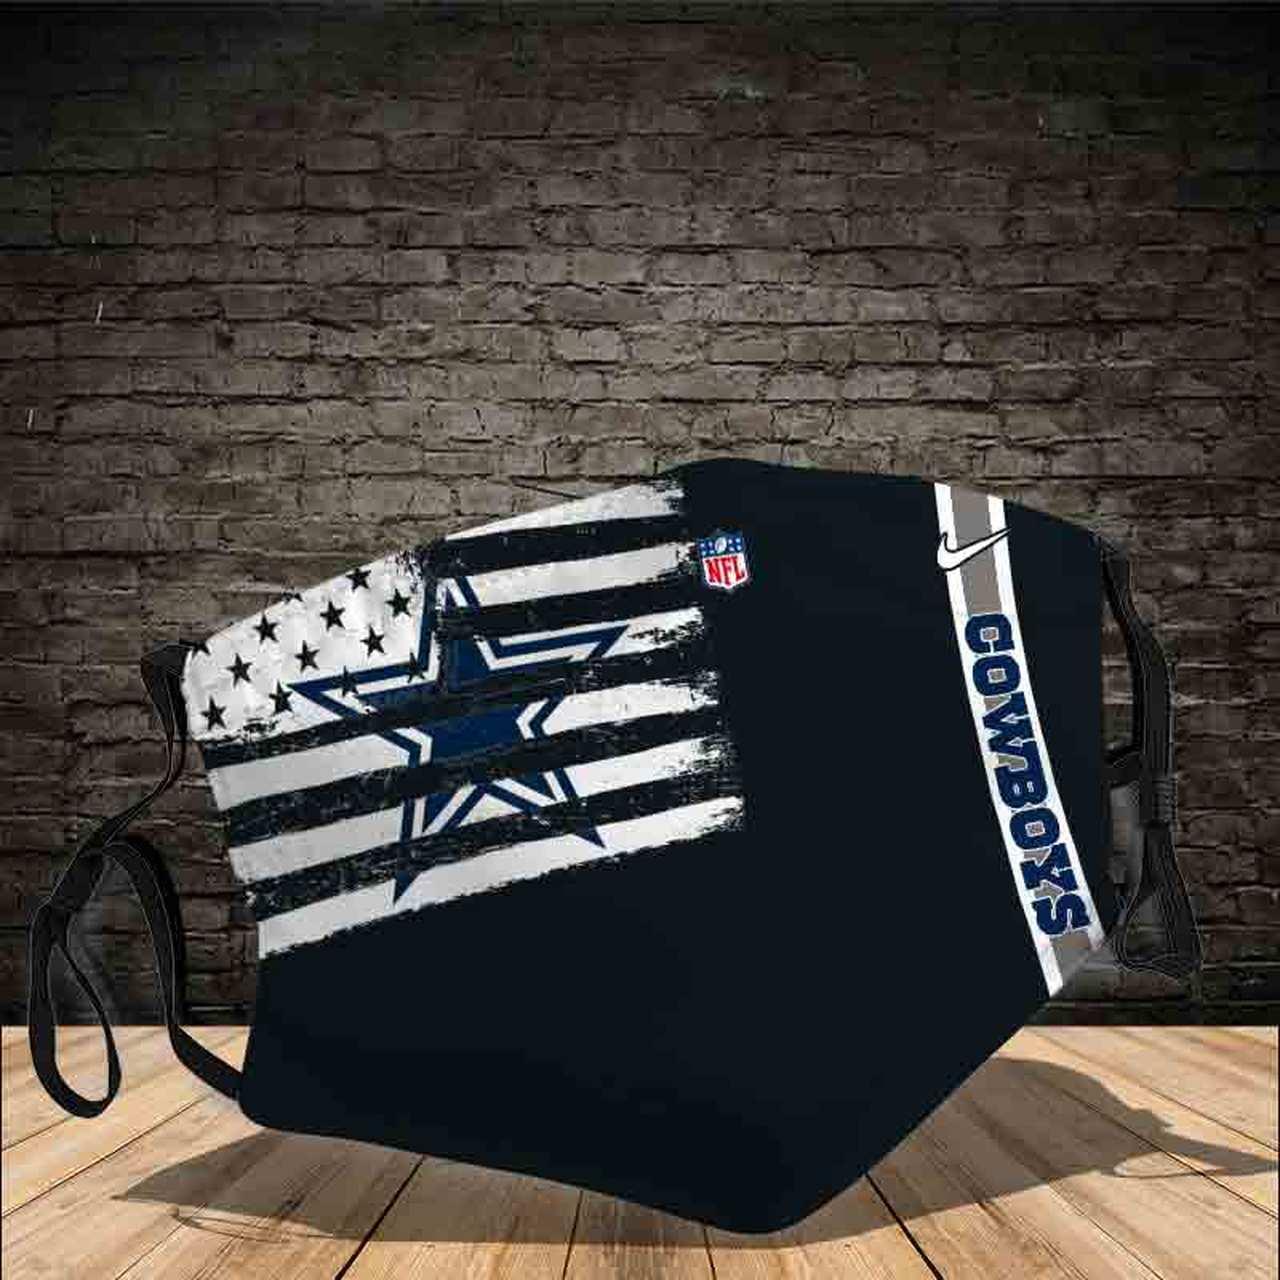 OFFICIAL NFL.DALLAS-COWBOYS Face Mask Gift, Washable Lawyer UK Mask Filter 1